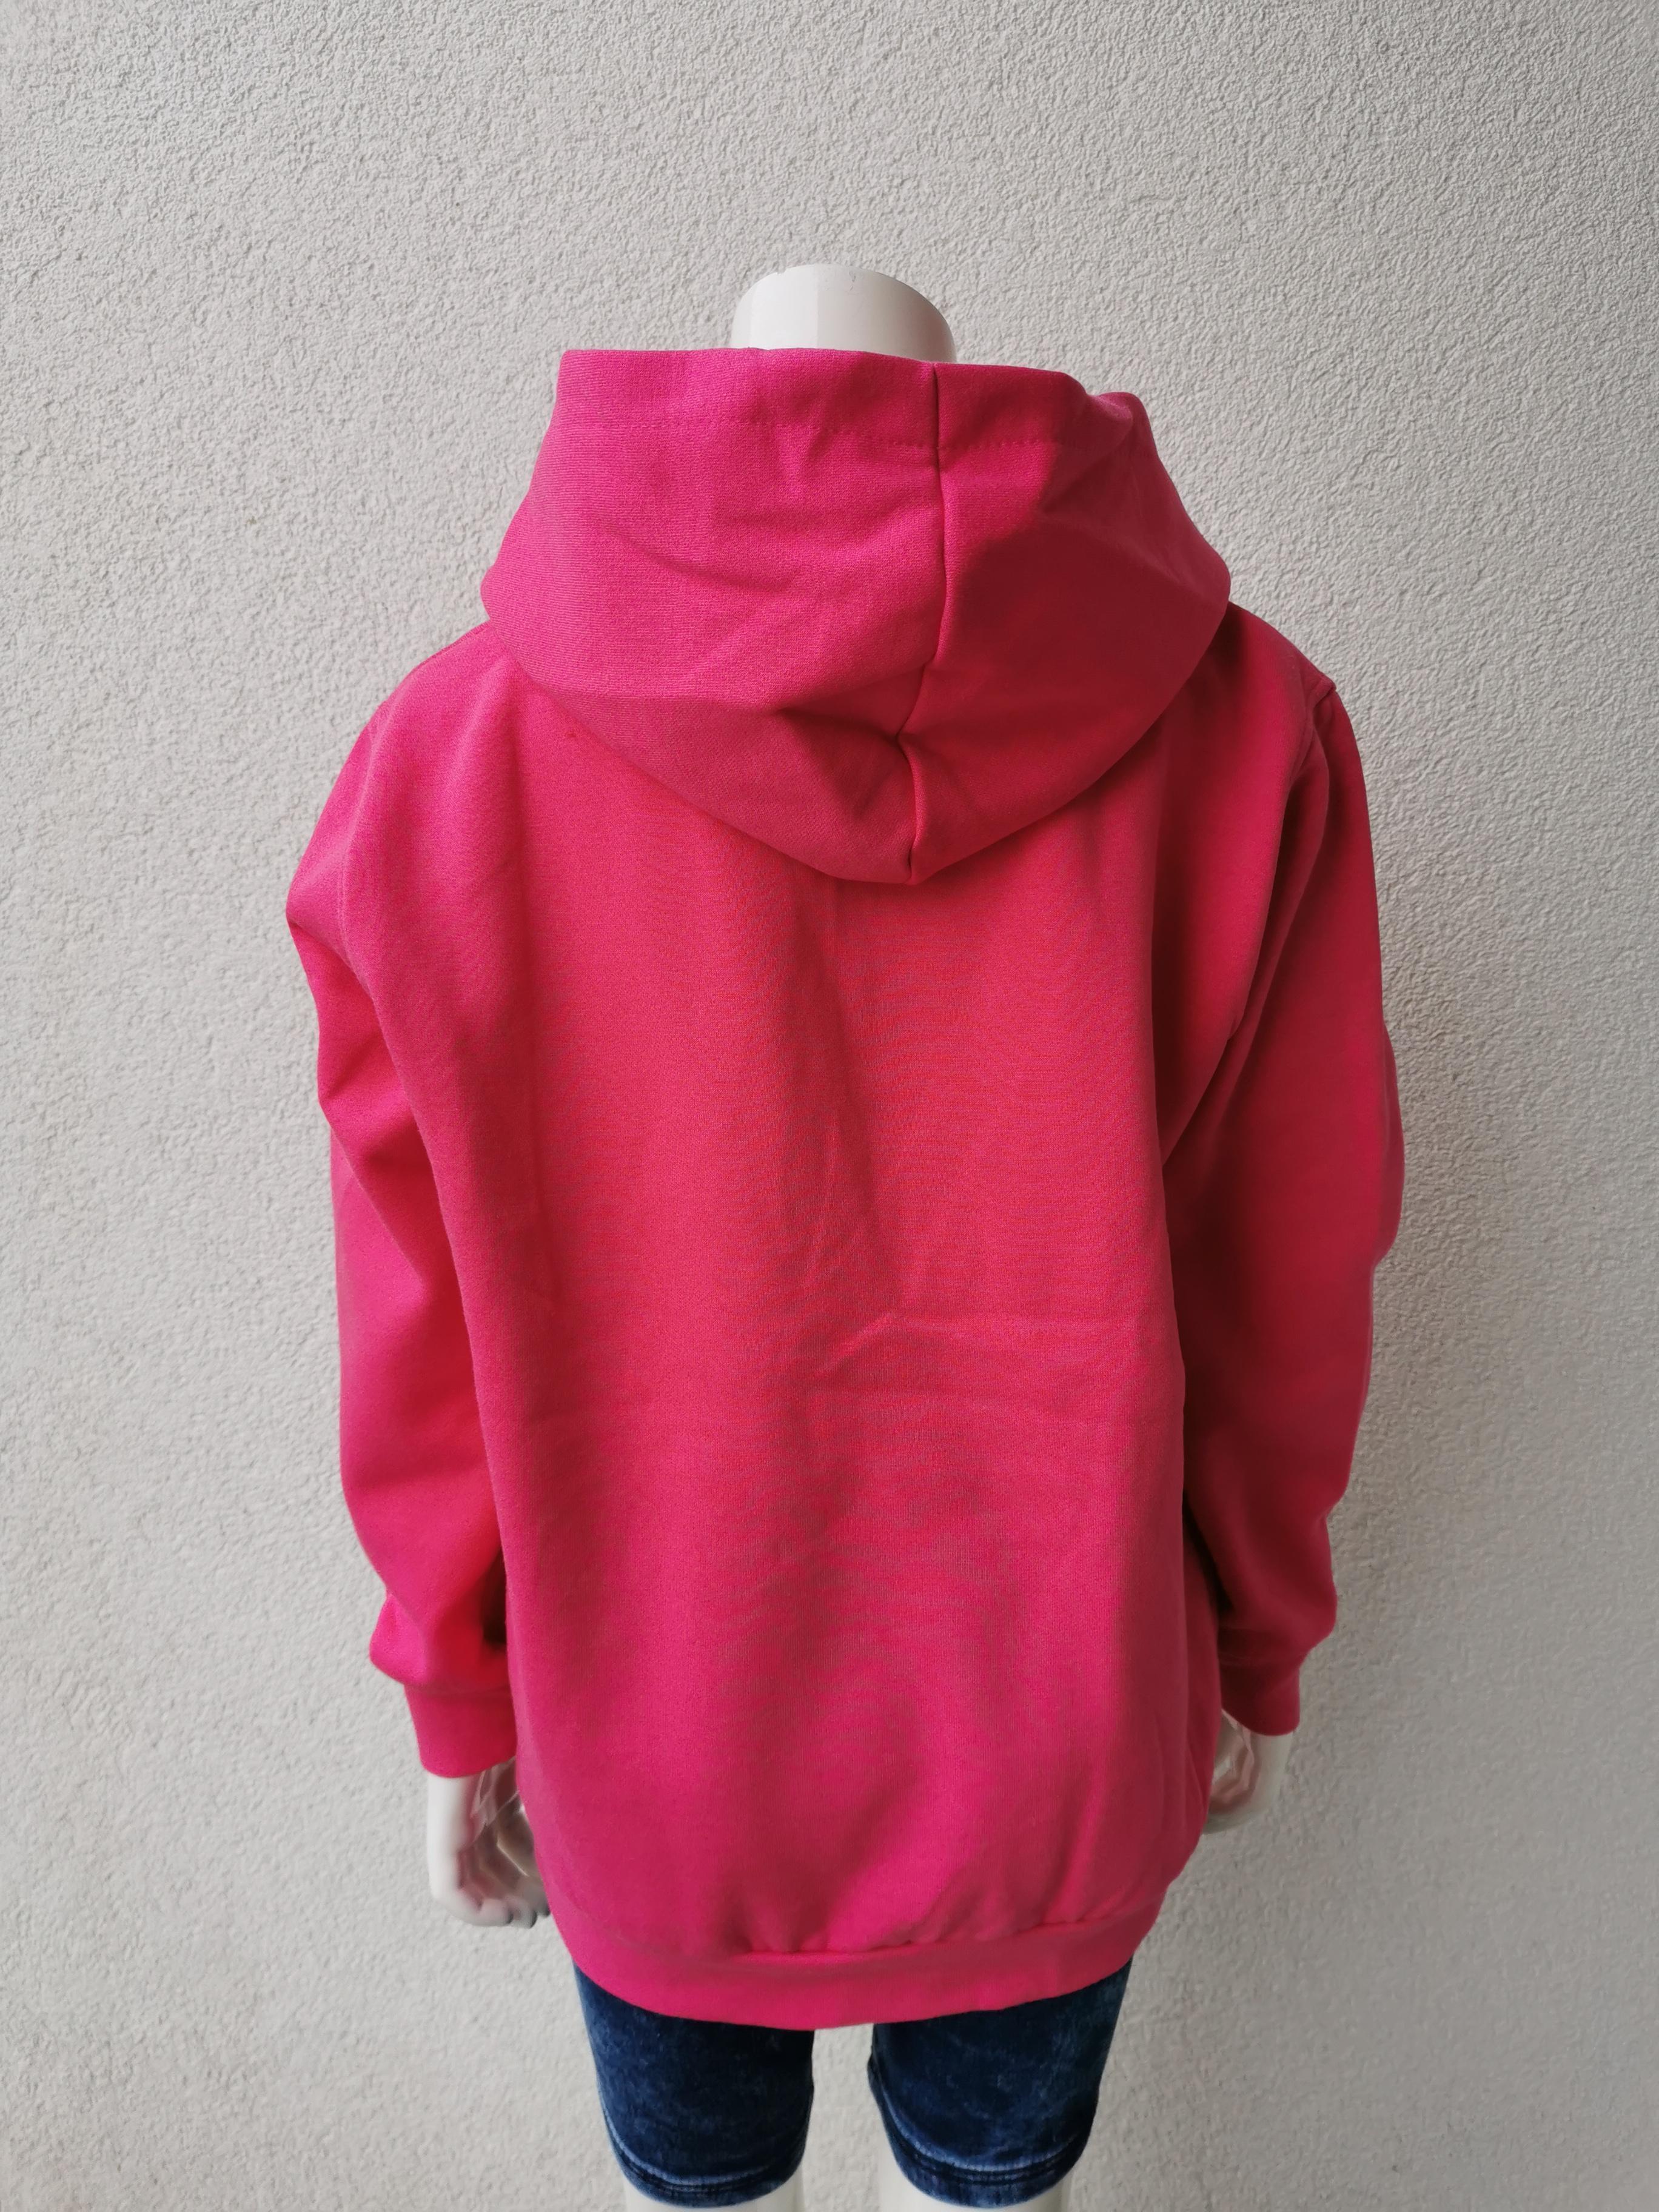 "Damen Sweater mit Kapuze ""Gumpi-Team"""